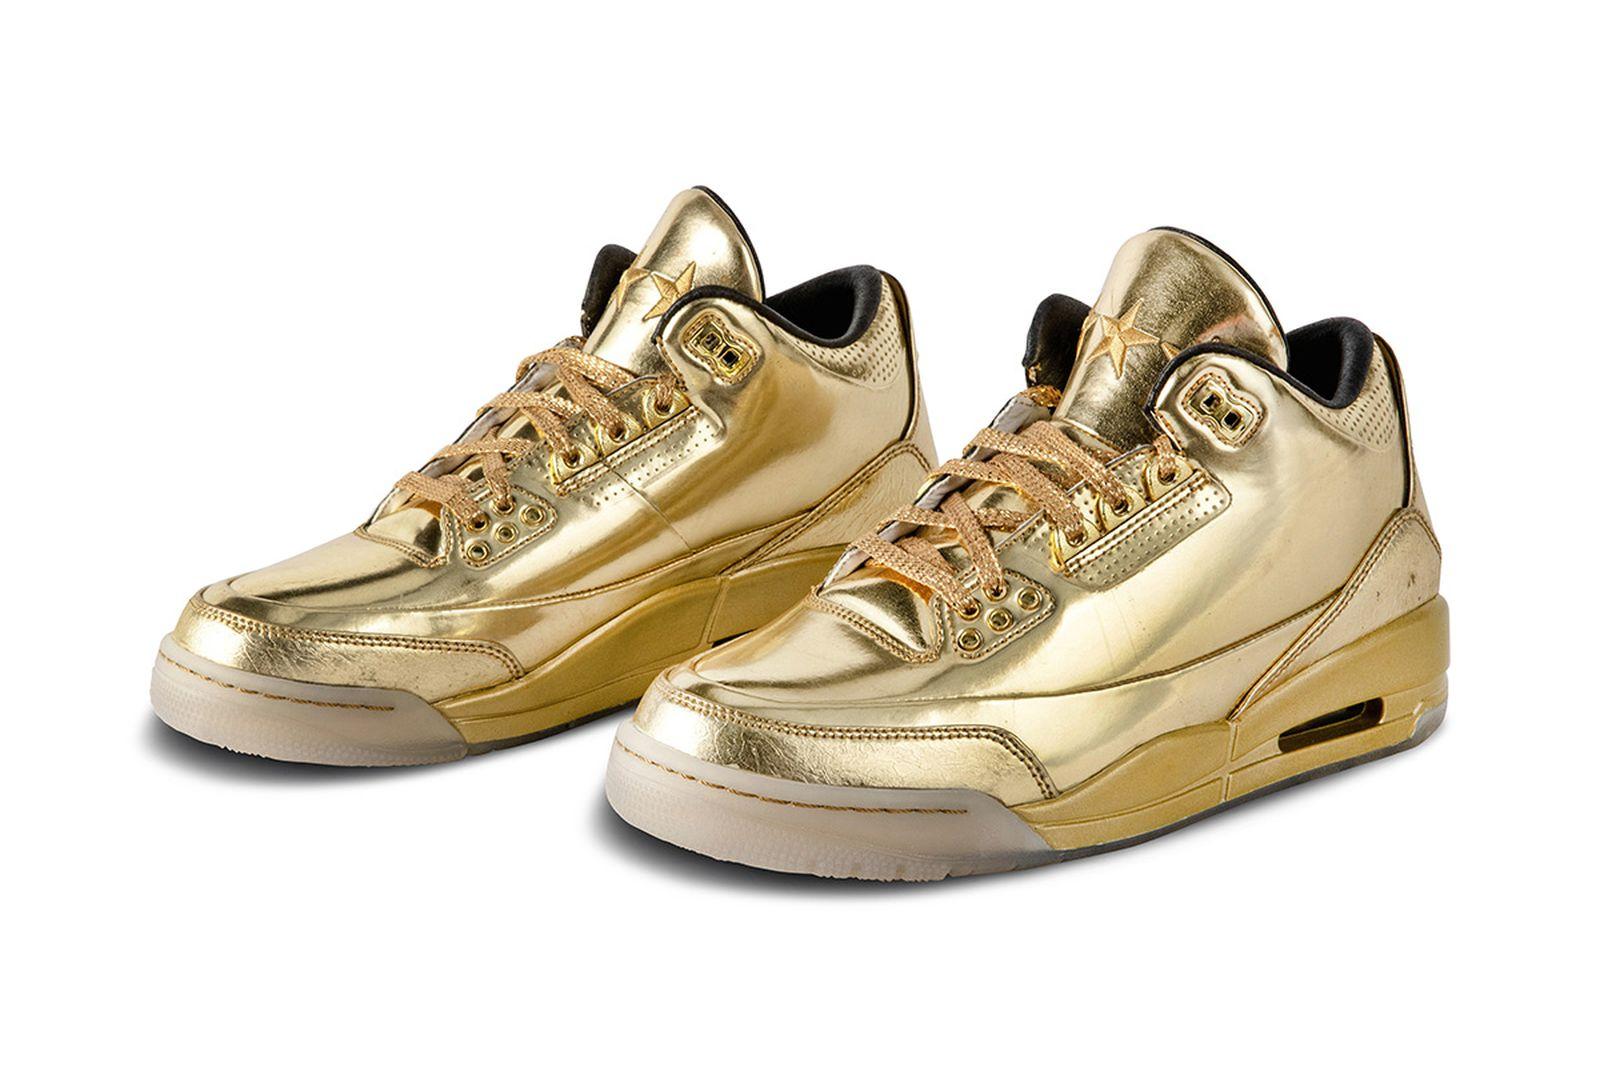 sothebys-rare-nike-sneaker-auction-10